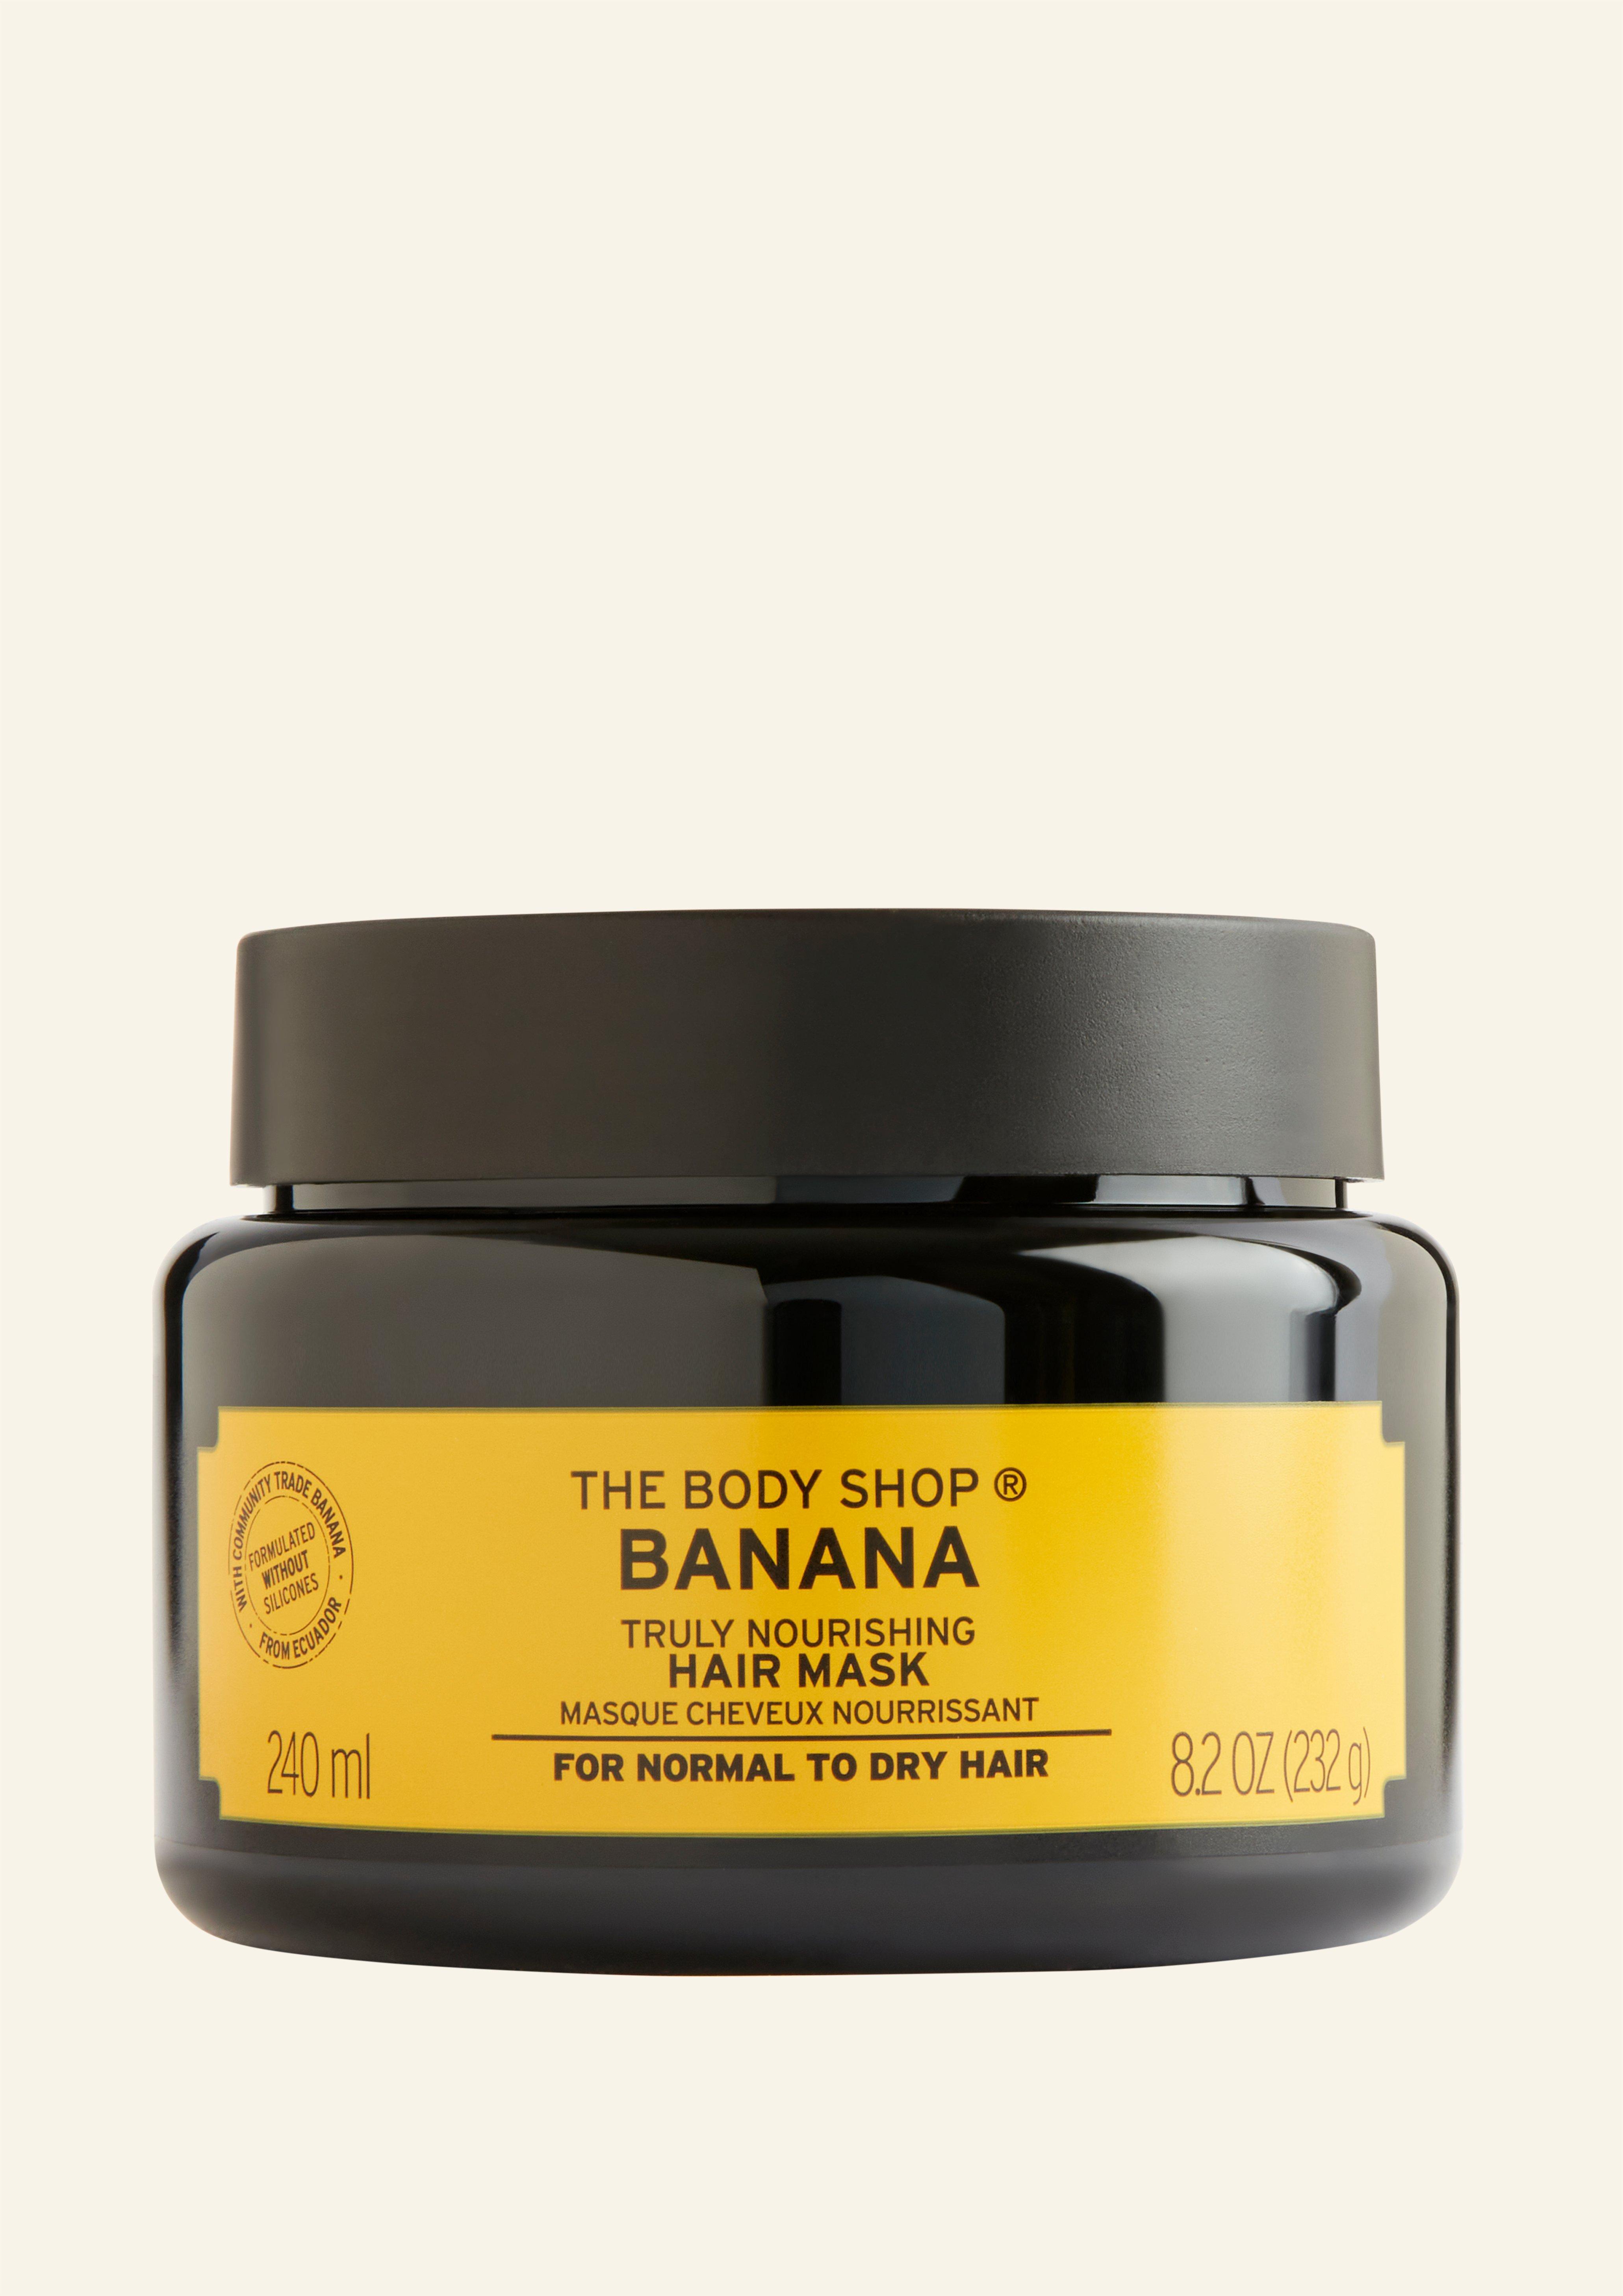 Maskë Flokësh Vërtet Ushqyes me Banane